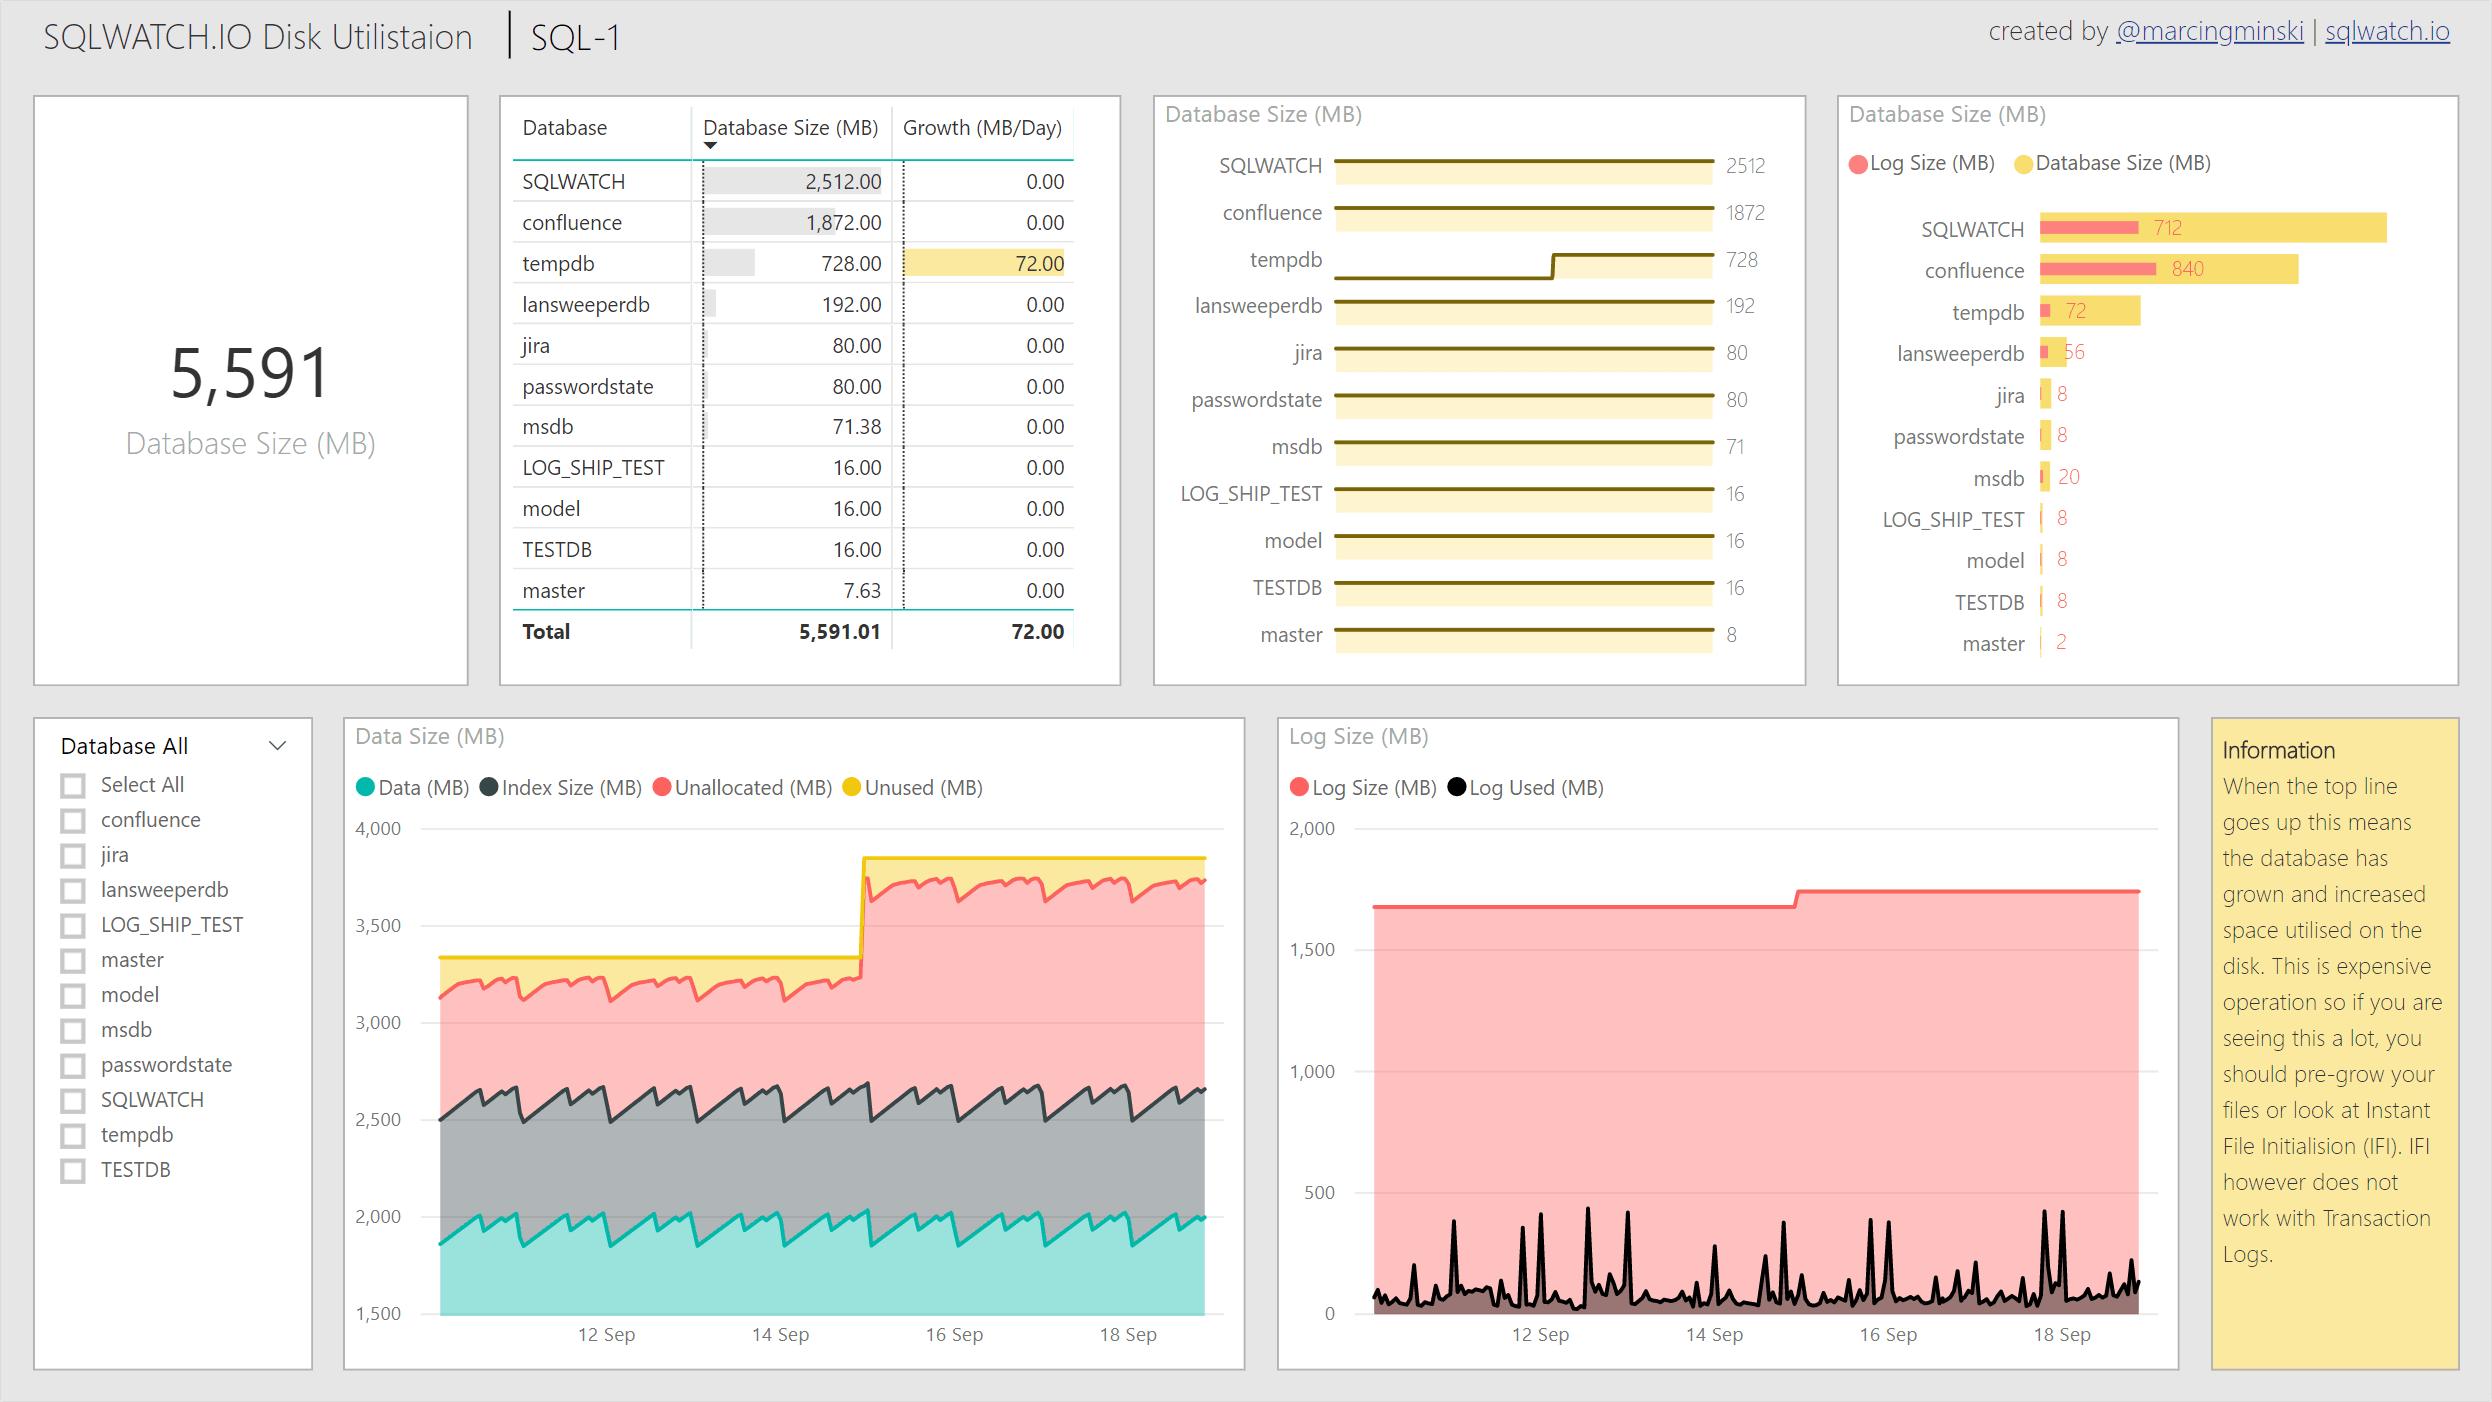 SQLWTCH disk utilisation dashboard